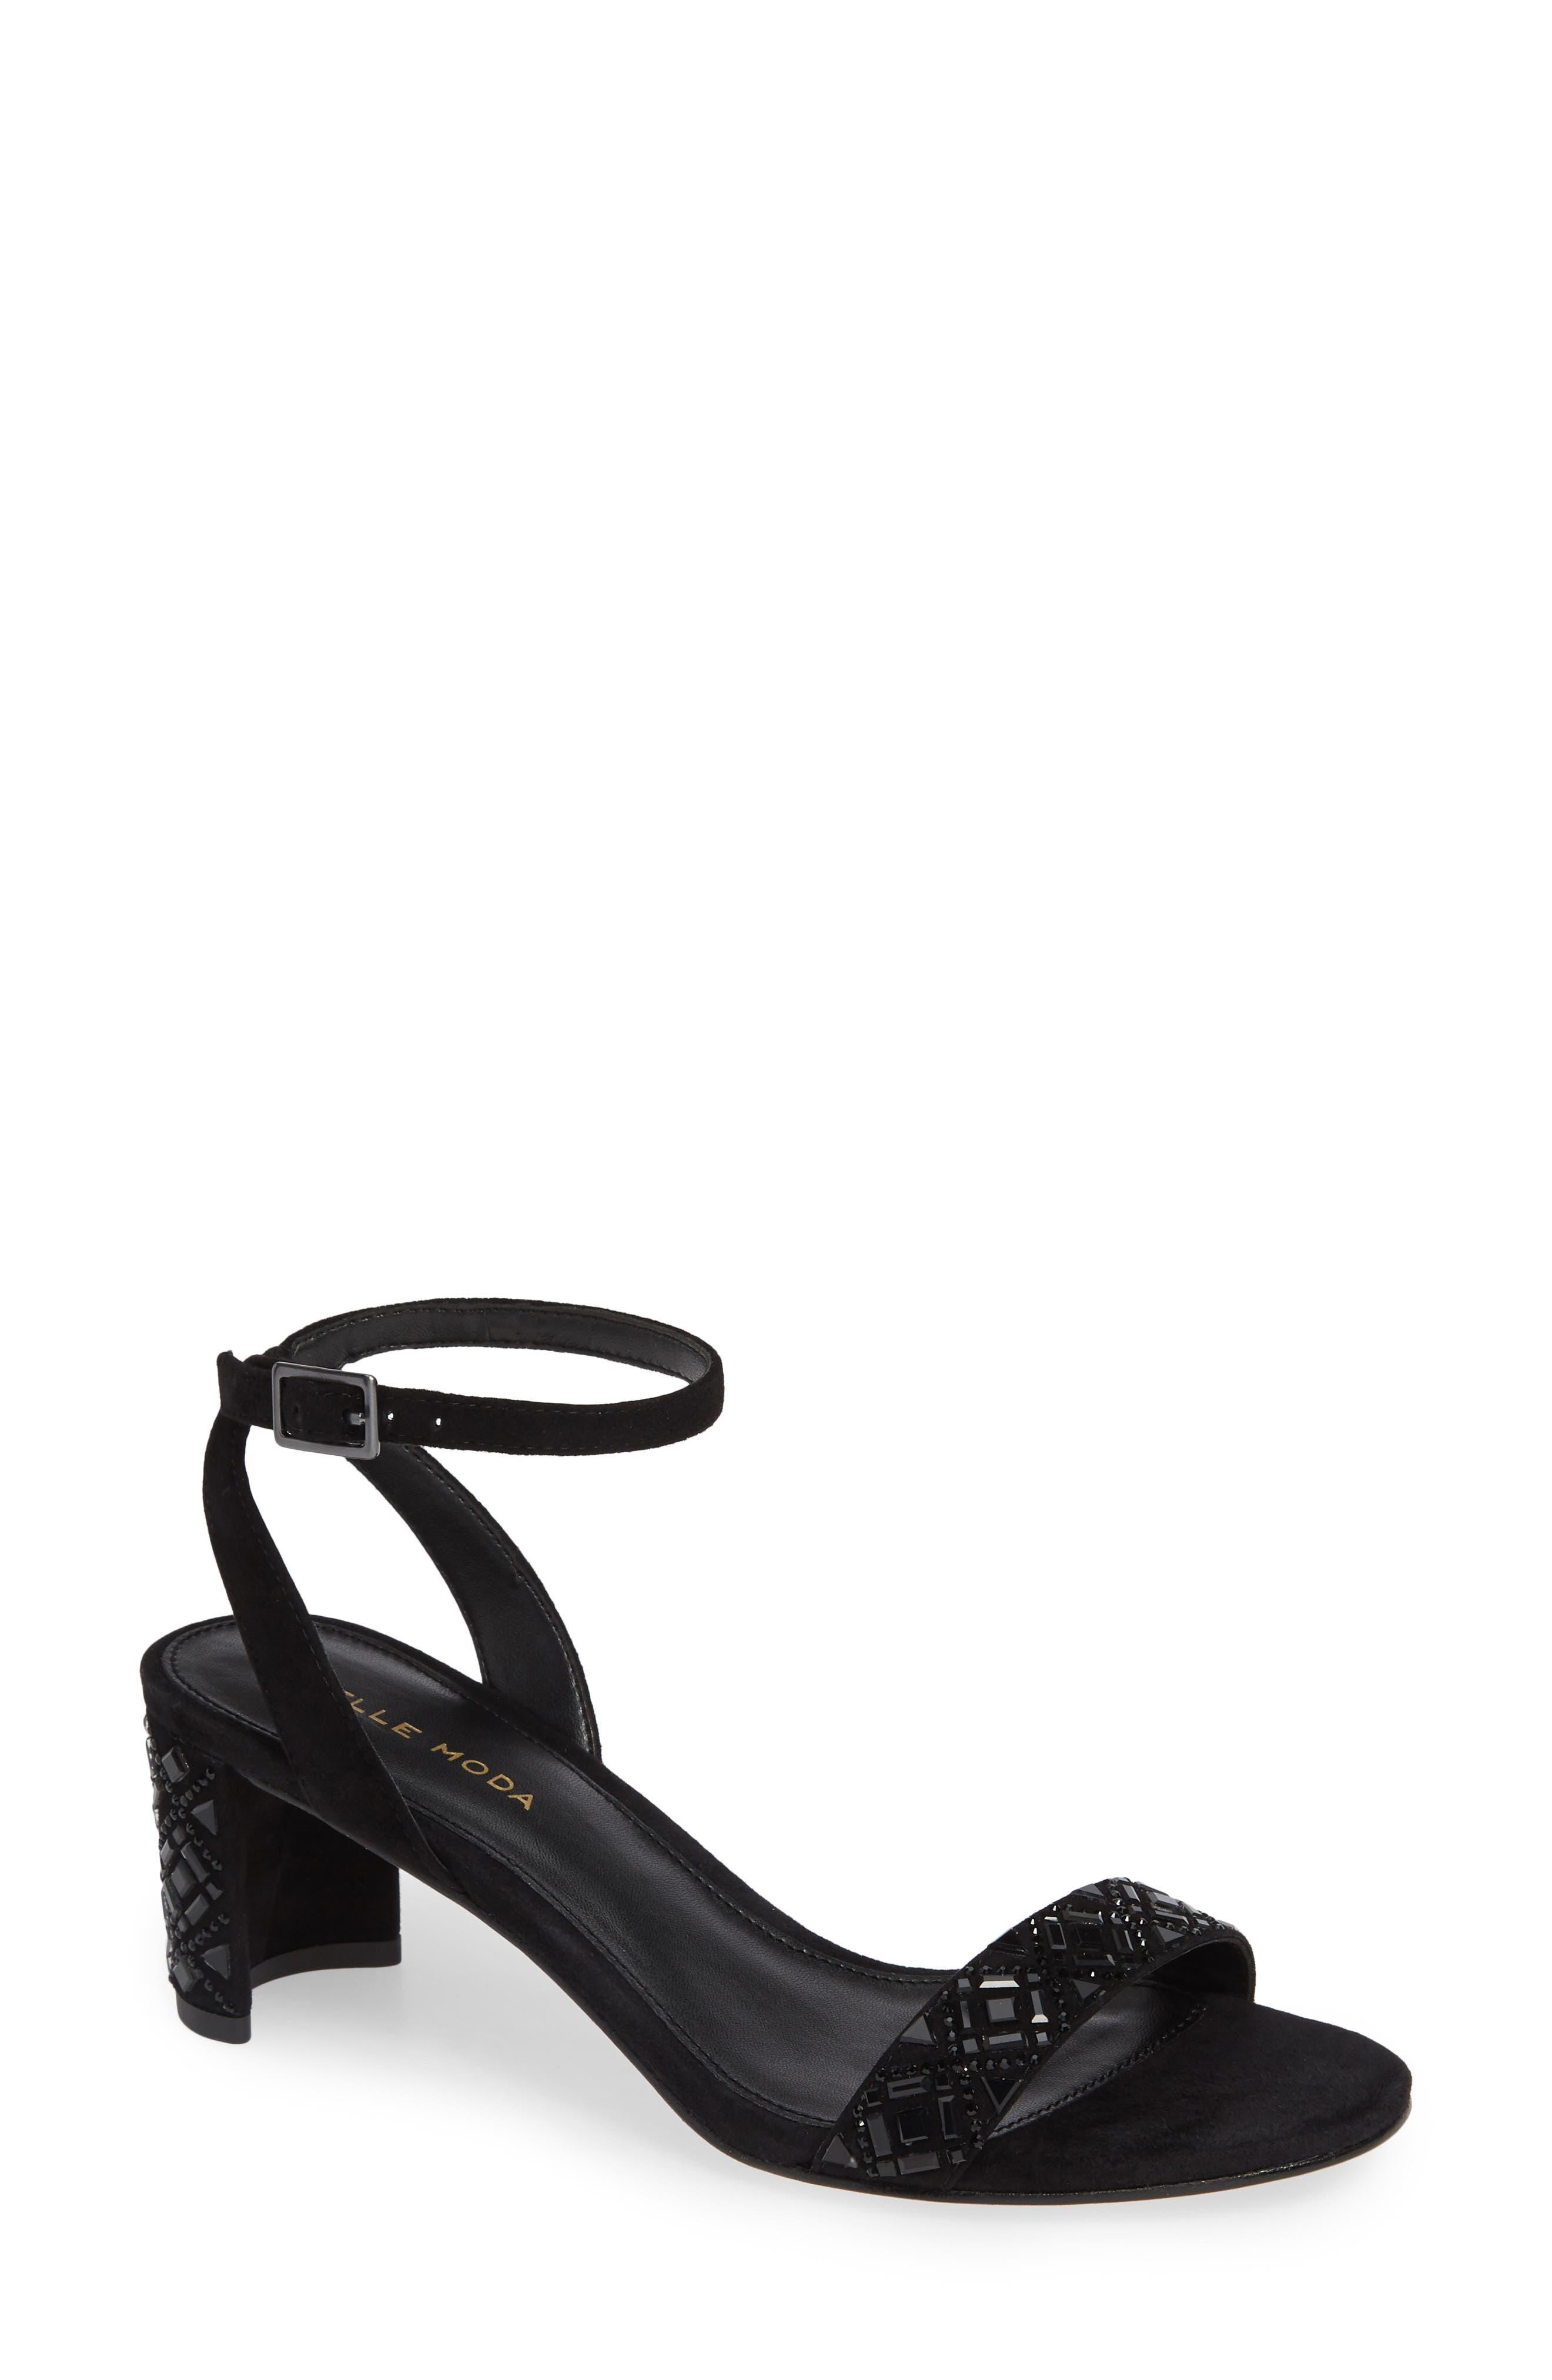 Moira Crystal Embellished Sandal,                             Main thumbnail 1, color,                             BLACK SUEDE